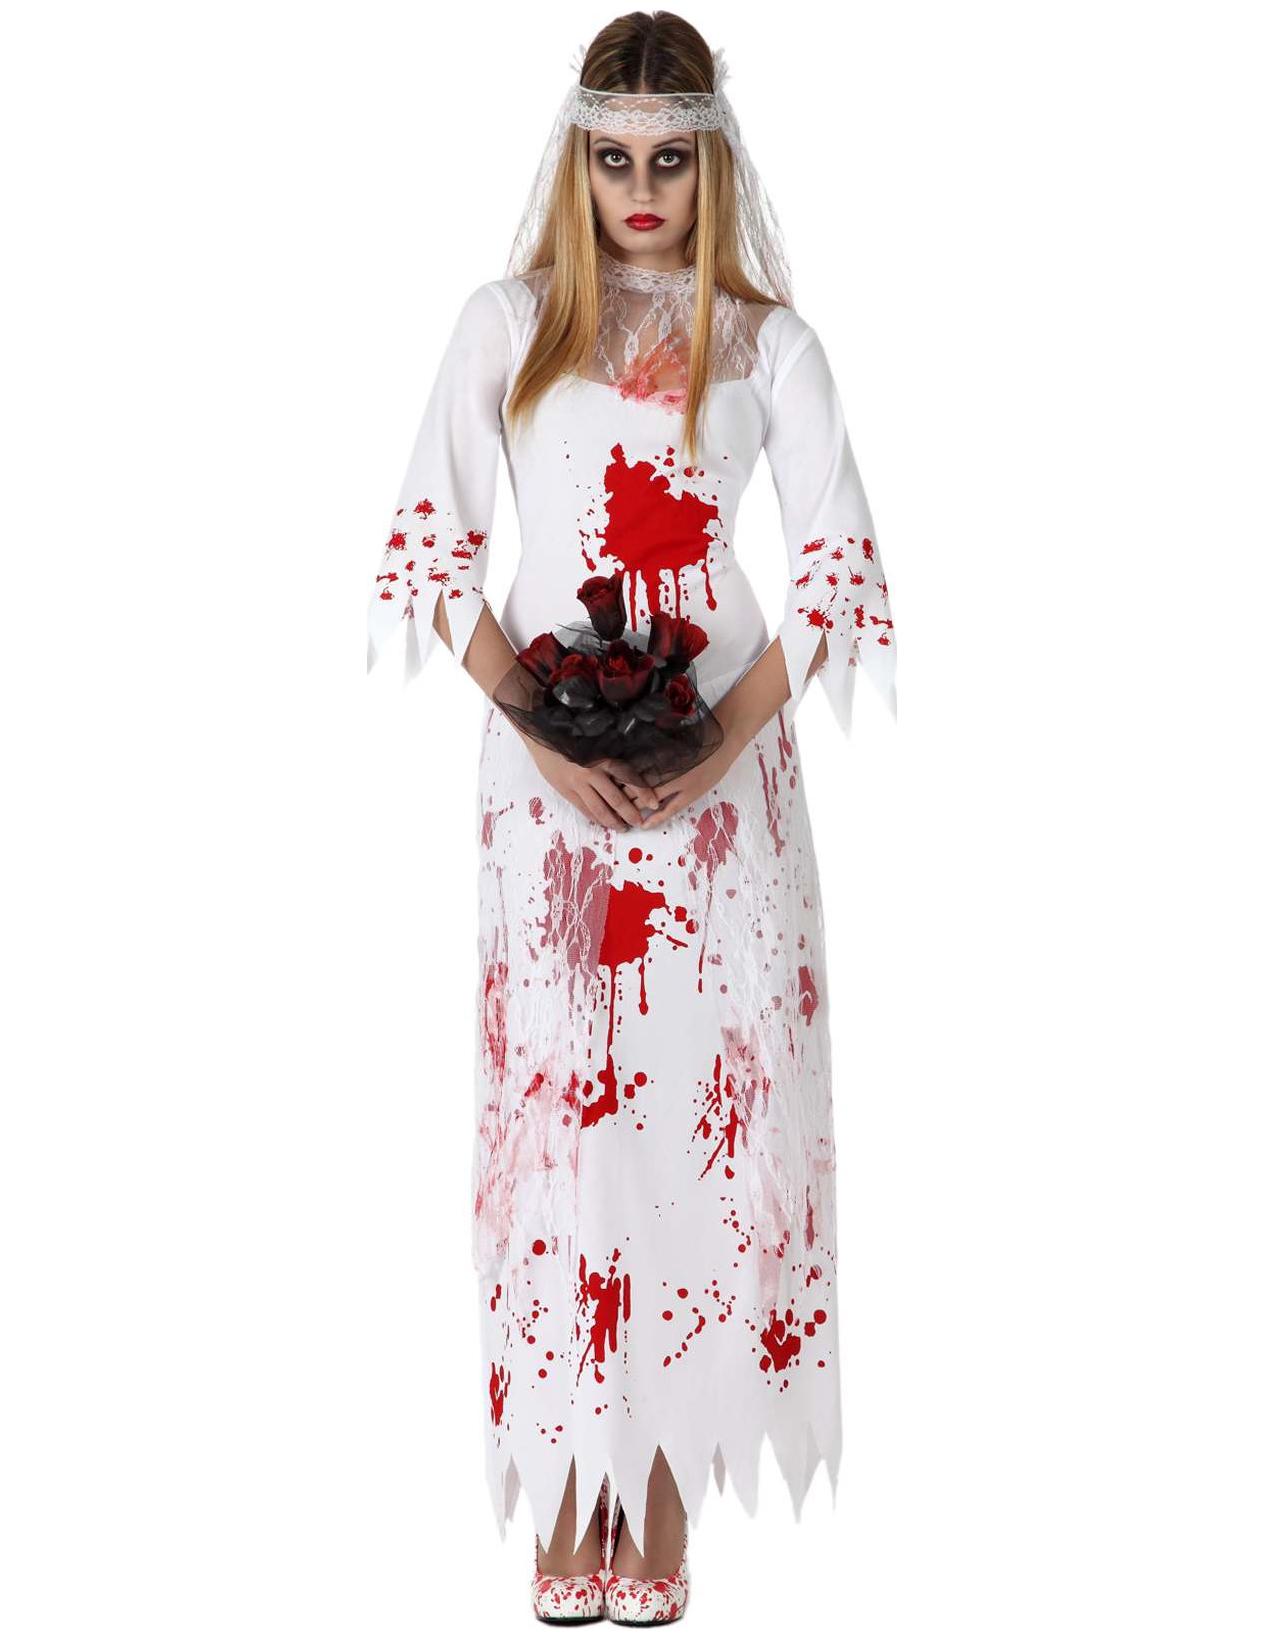 Maquillage Halloween Mariee.Deguisement Mariee Ensanglantee Femme Effrayante Halloween Deguise Toi Achat De Deguisements Adultes